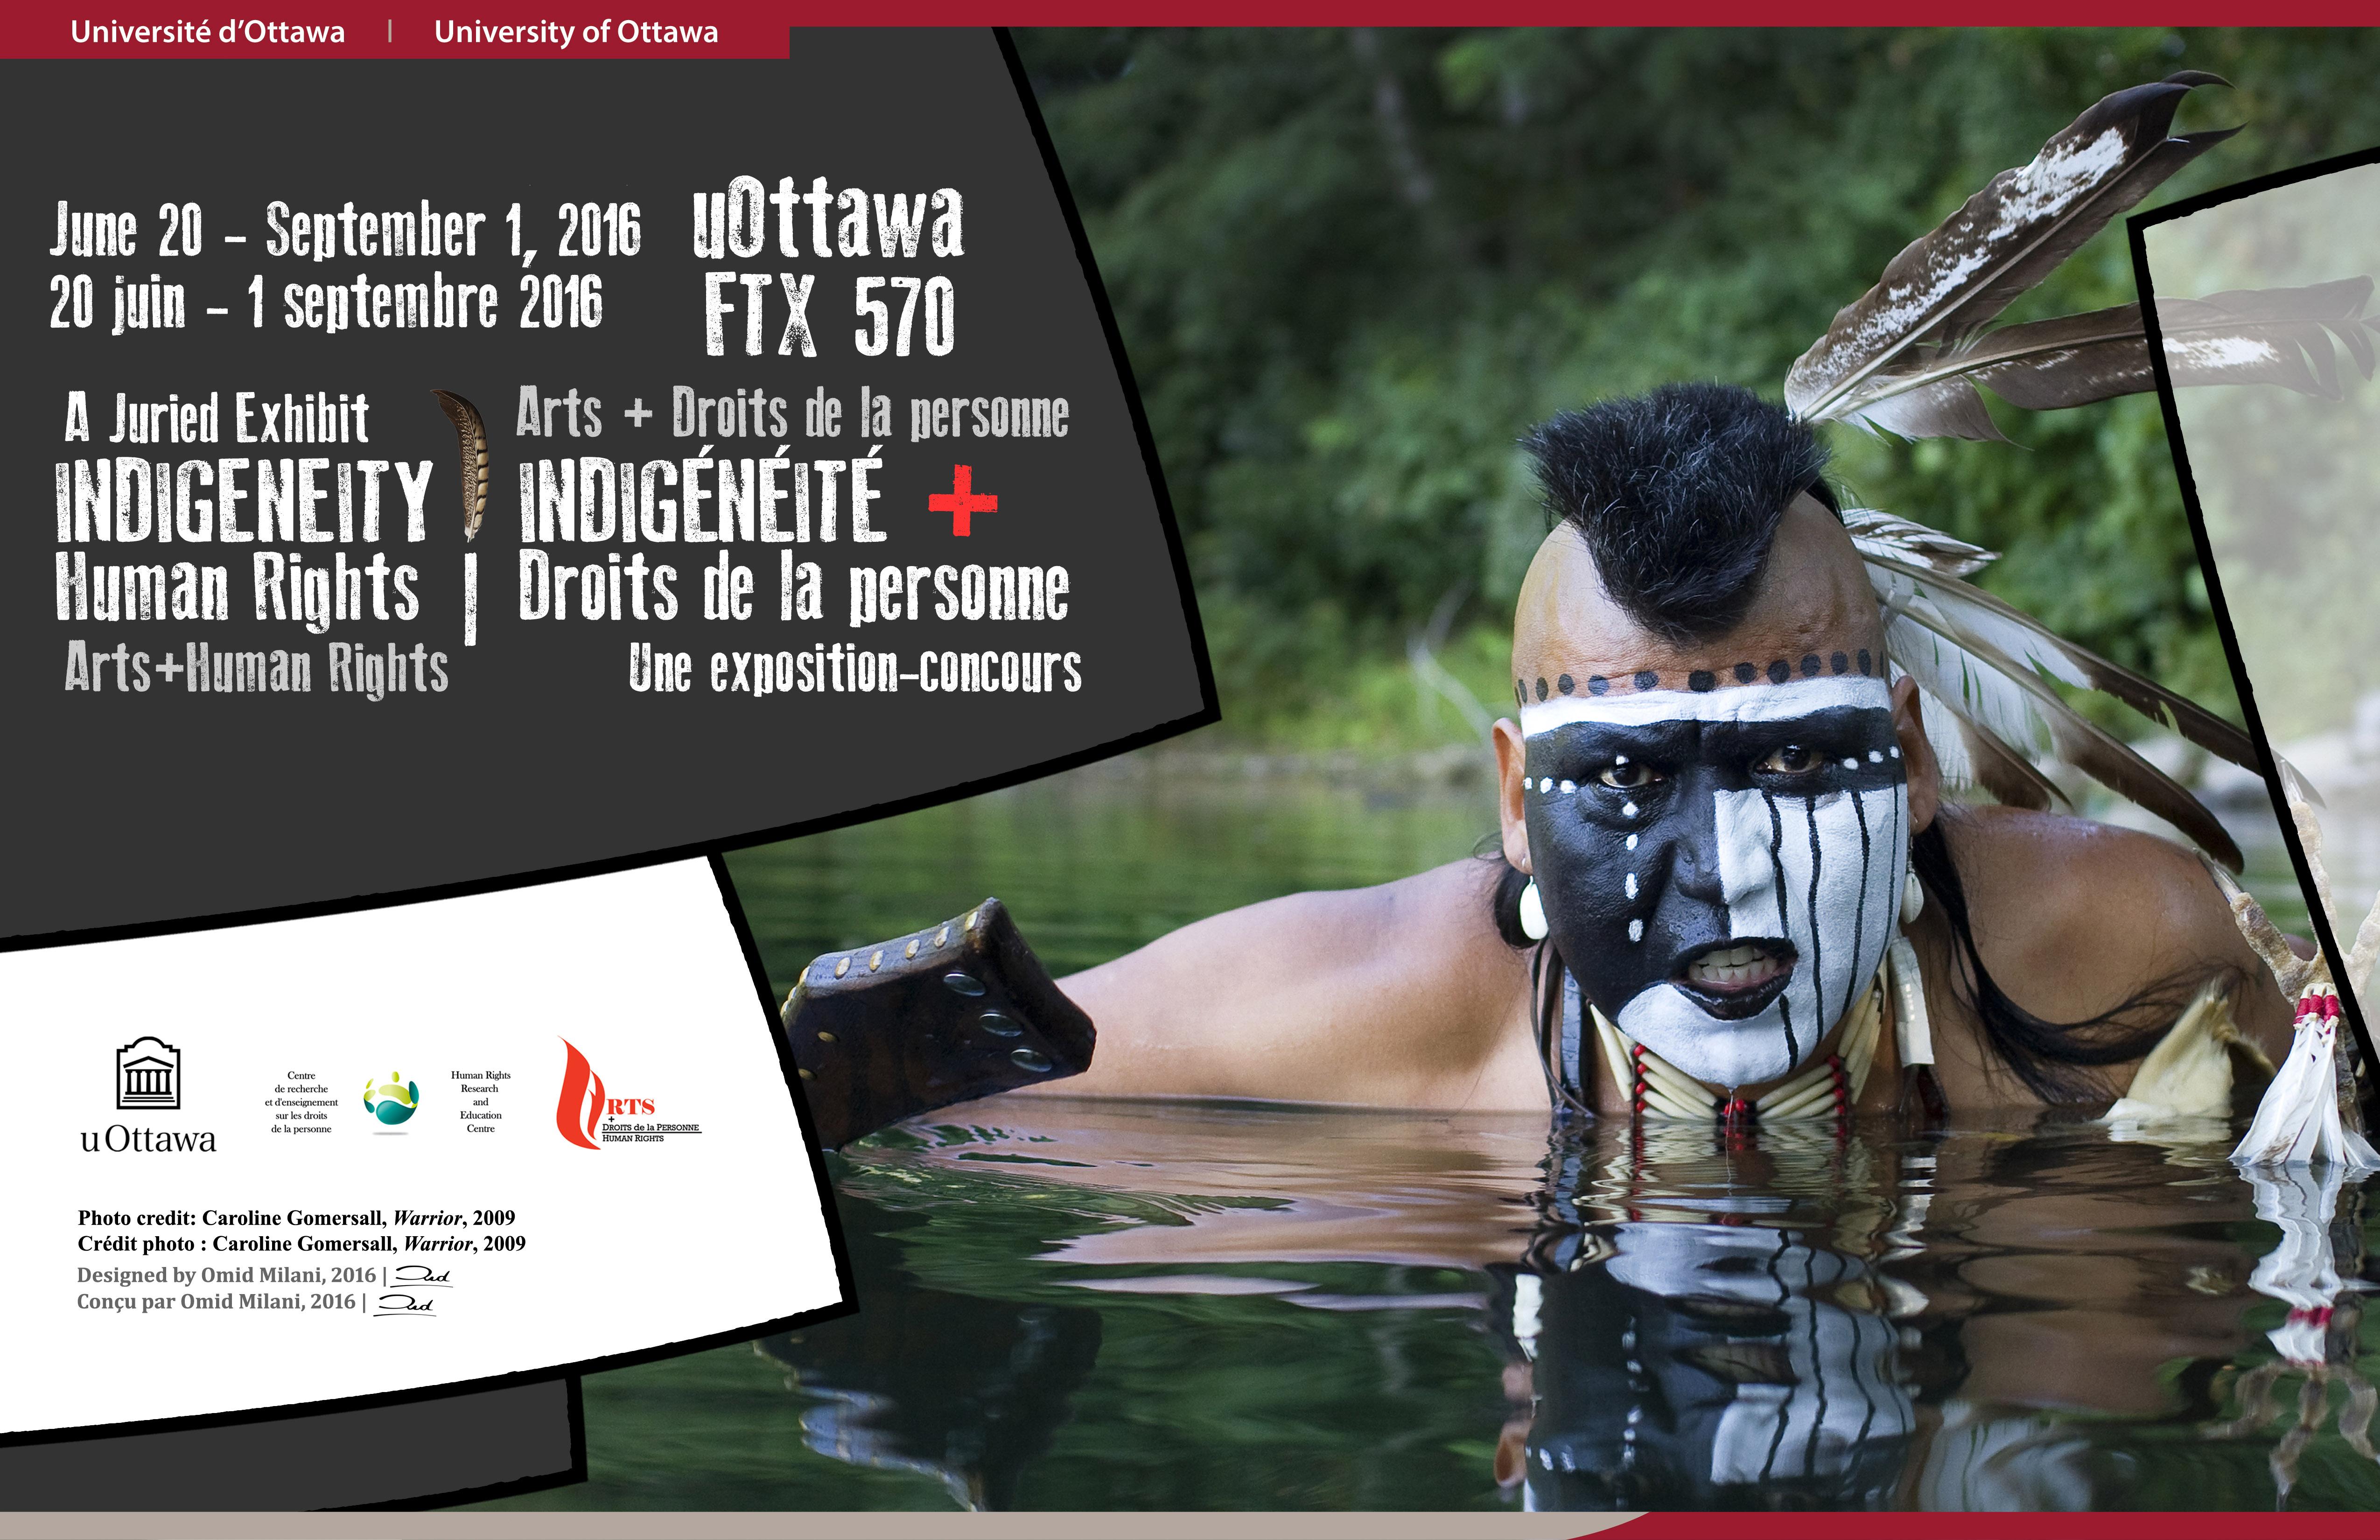 Exhibition Indigeneity | Exposition Indigénéité